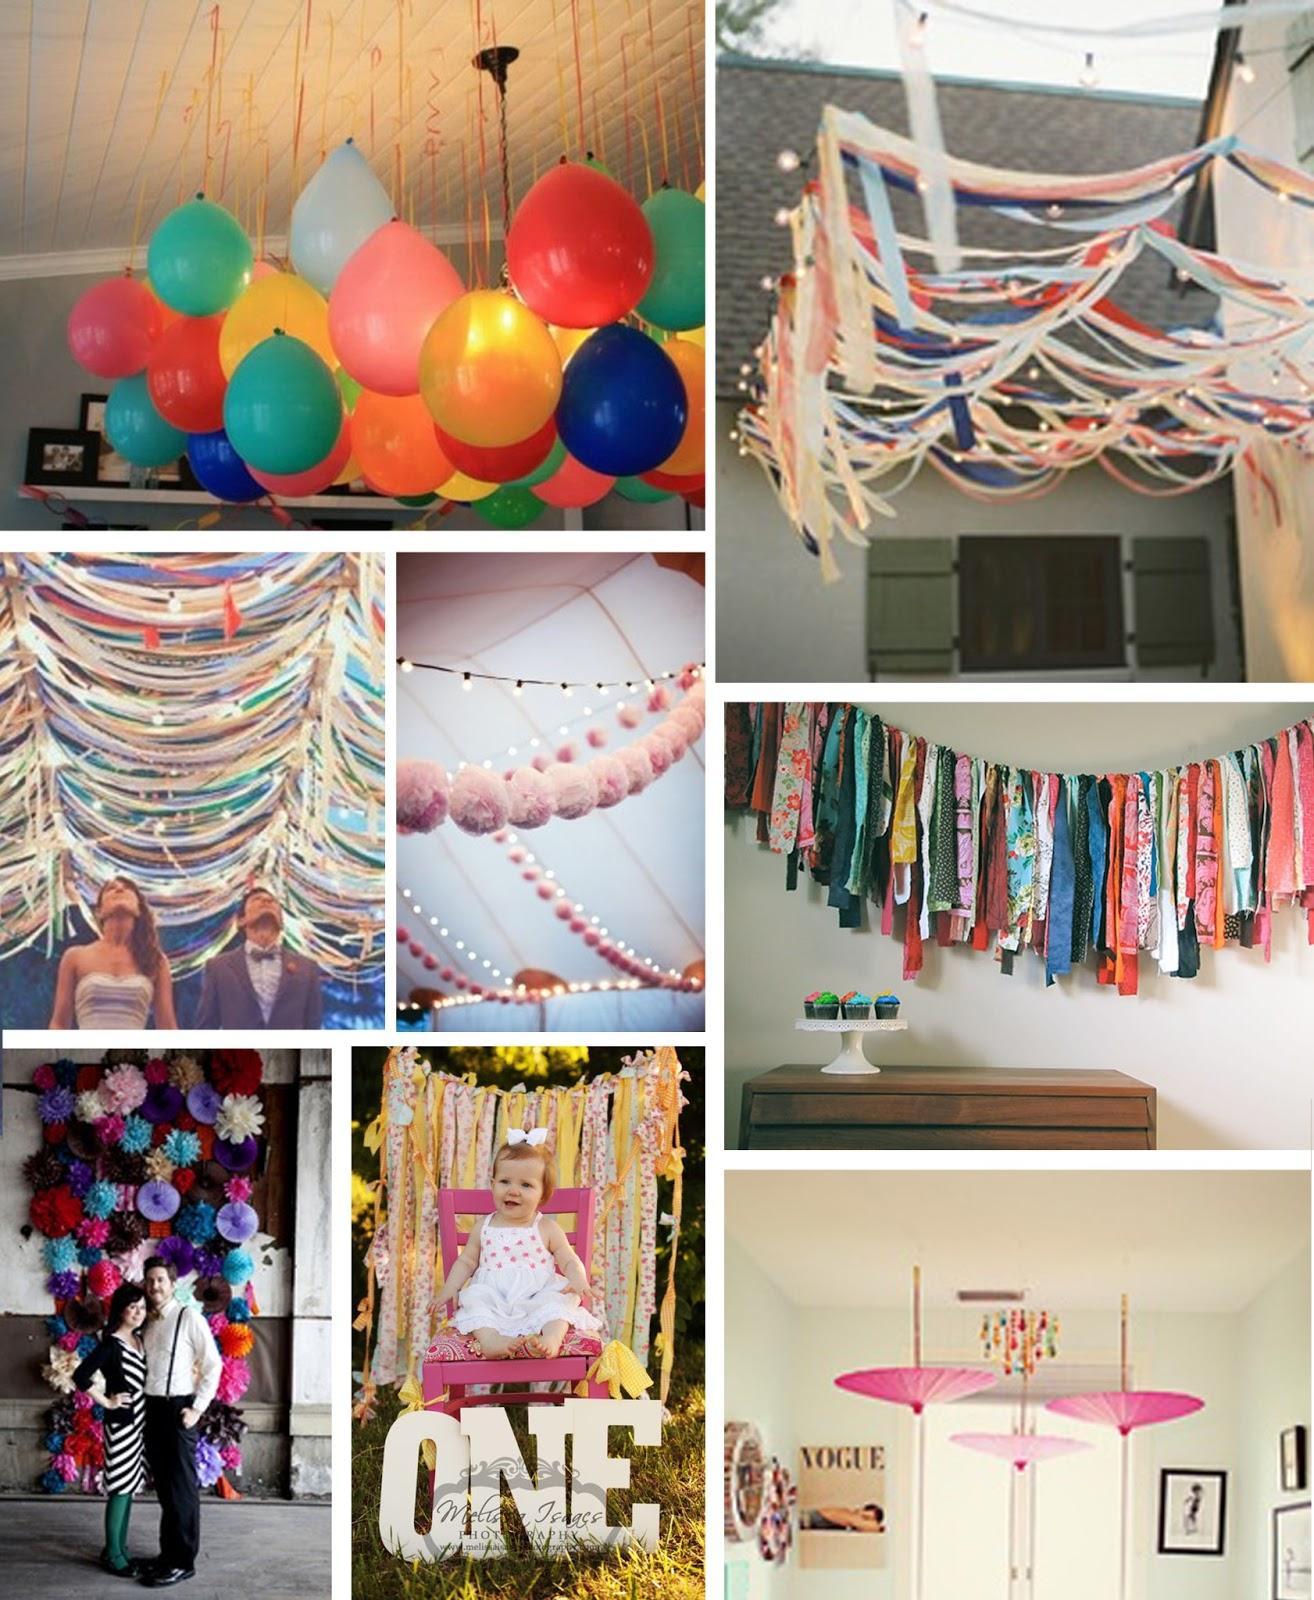 Detalles para una fiesta infantil paperblog - Detalles de fiesta ...